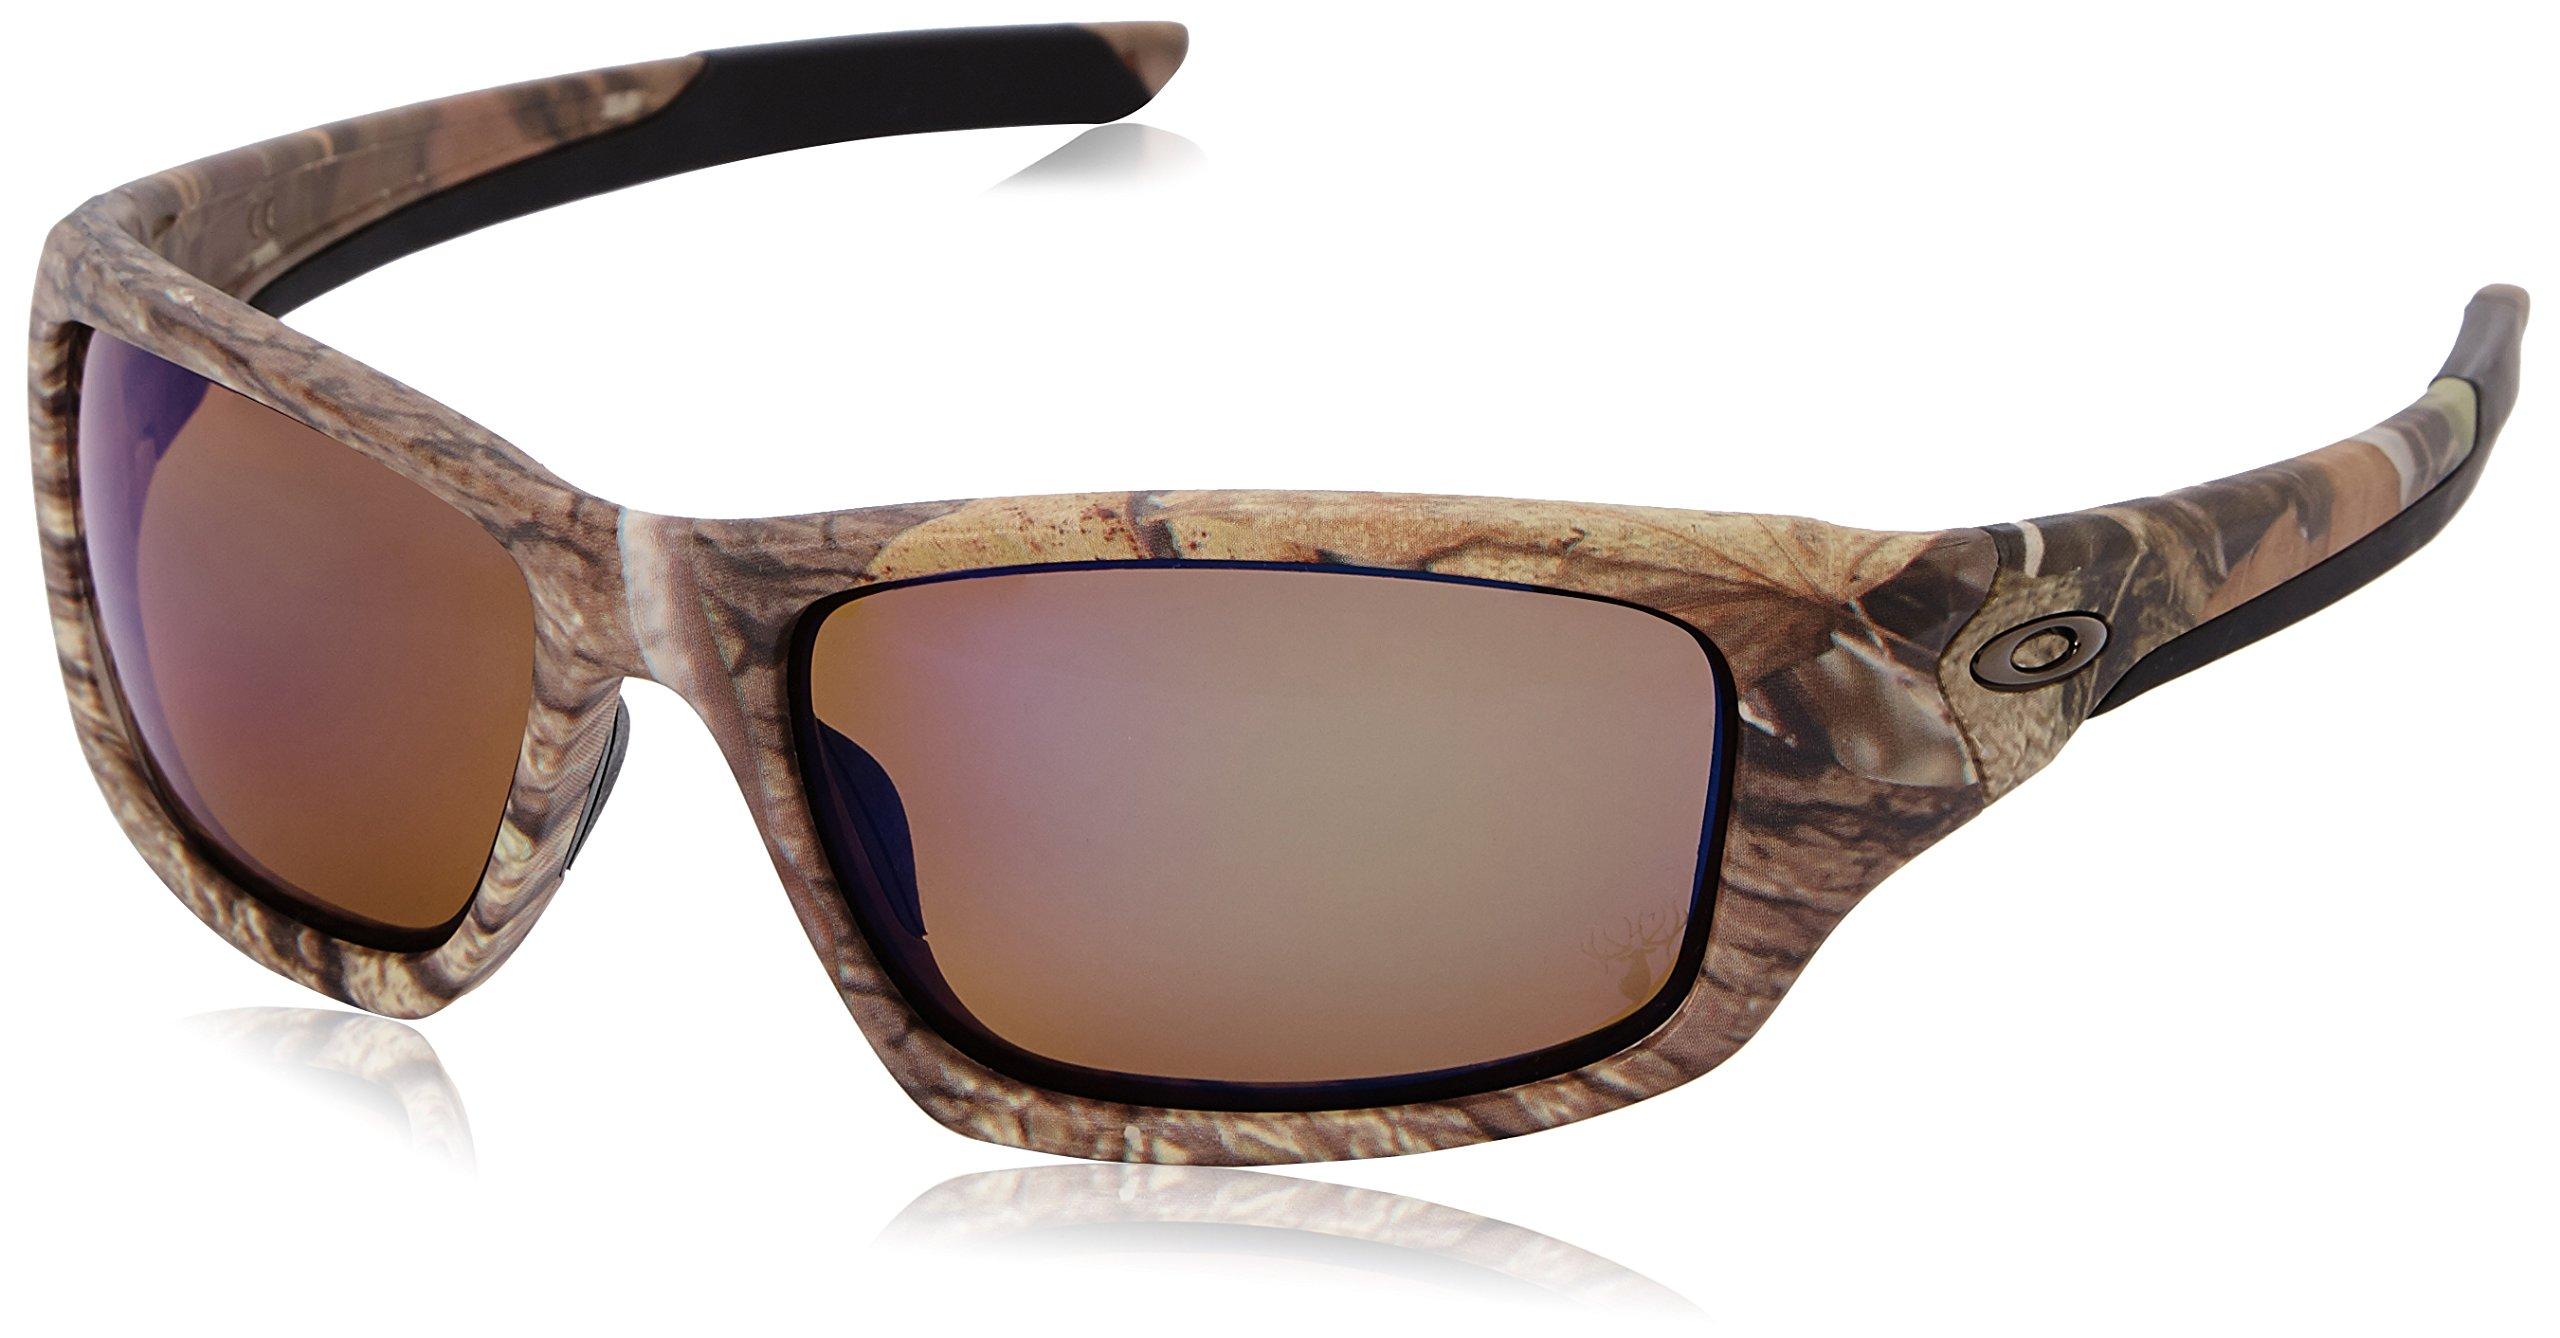 Oakley Herren Sonnenbrille Valve, Gr. One size, Shallow Blau Polarized